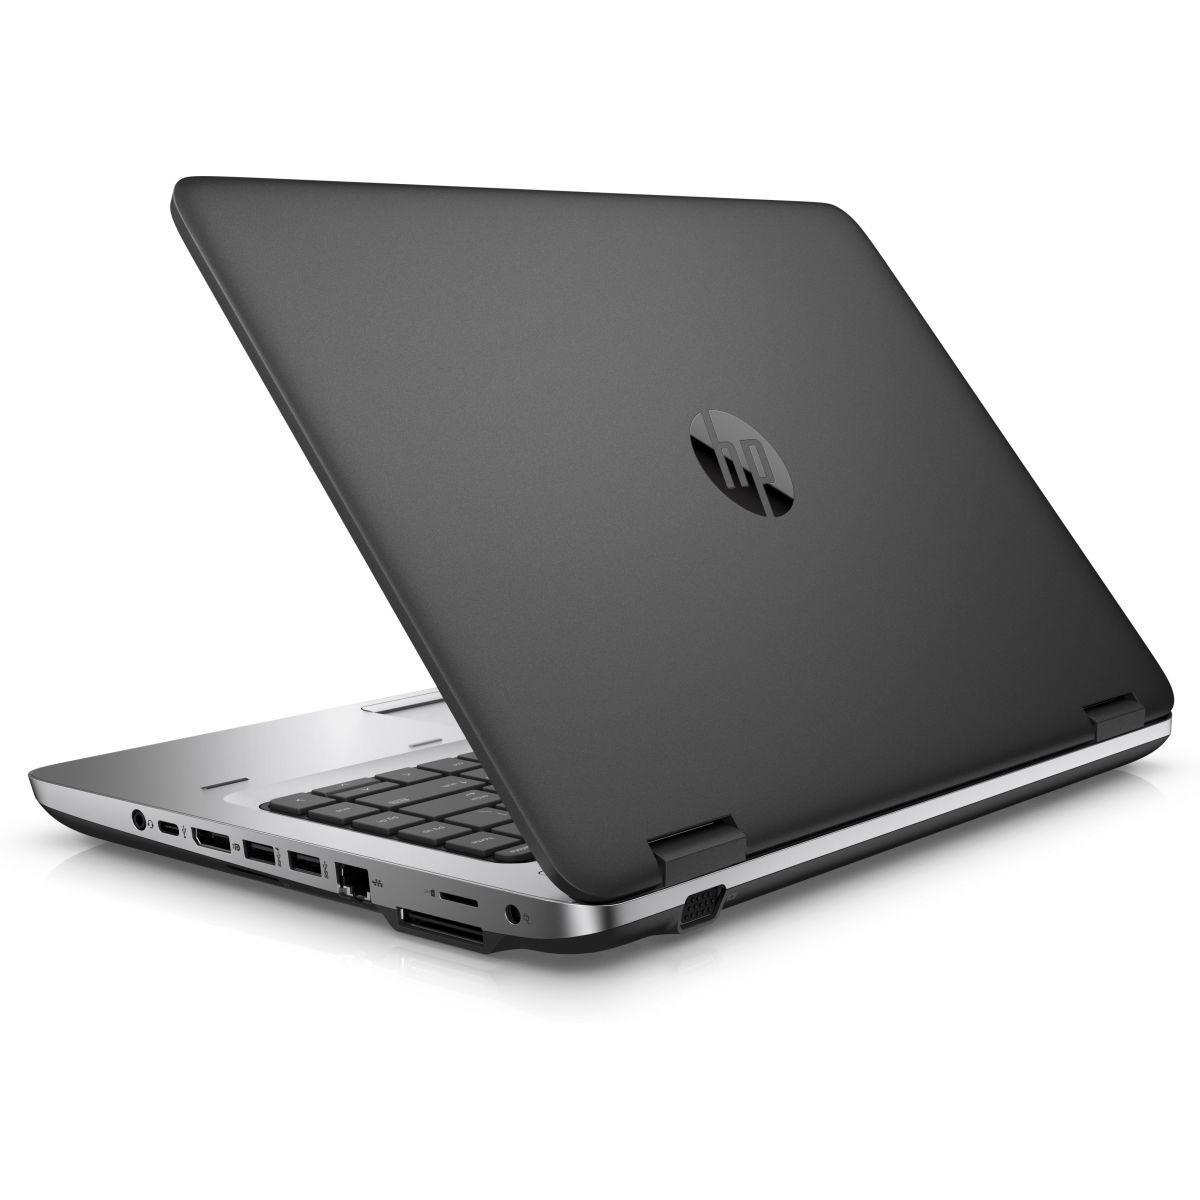 "HP ProBook 640 G2 14"" Core i5 2,4 GHz - HDD 500 Go - 16 Go AZERTY - Français"